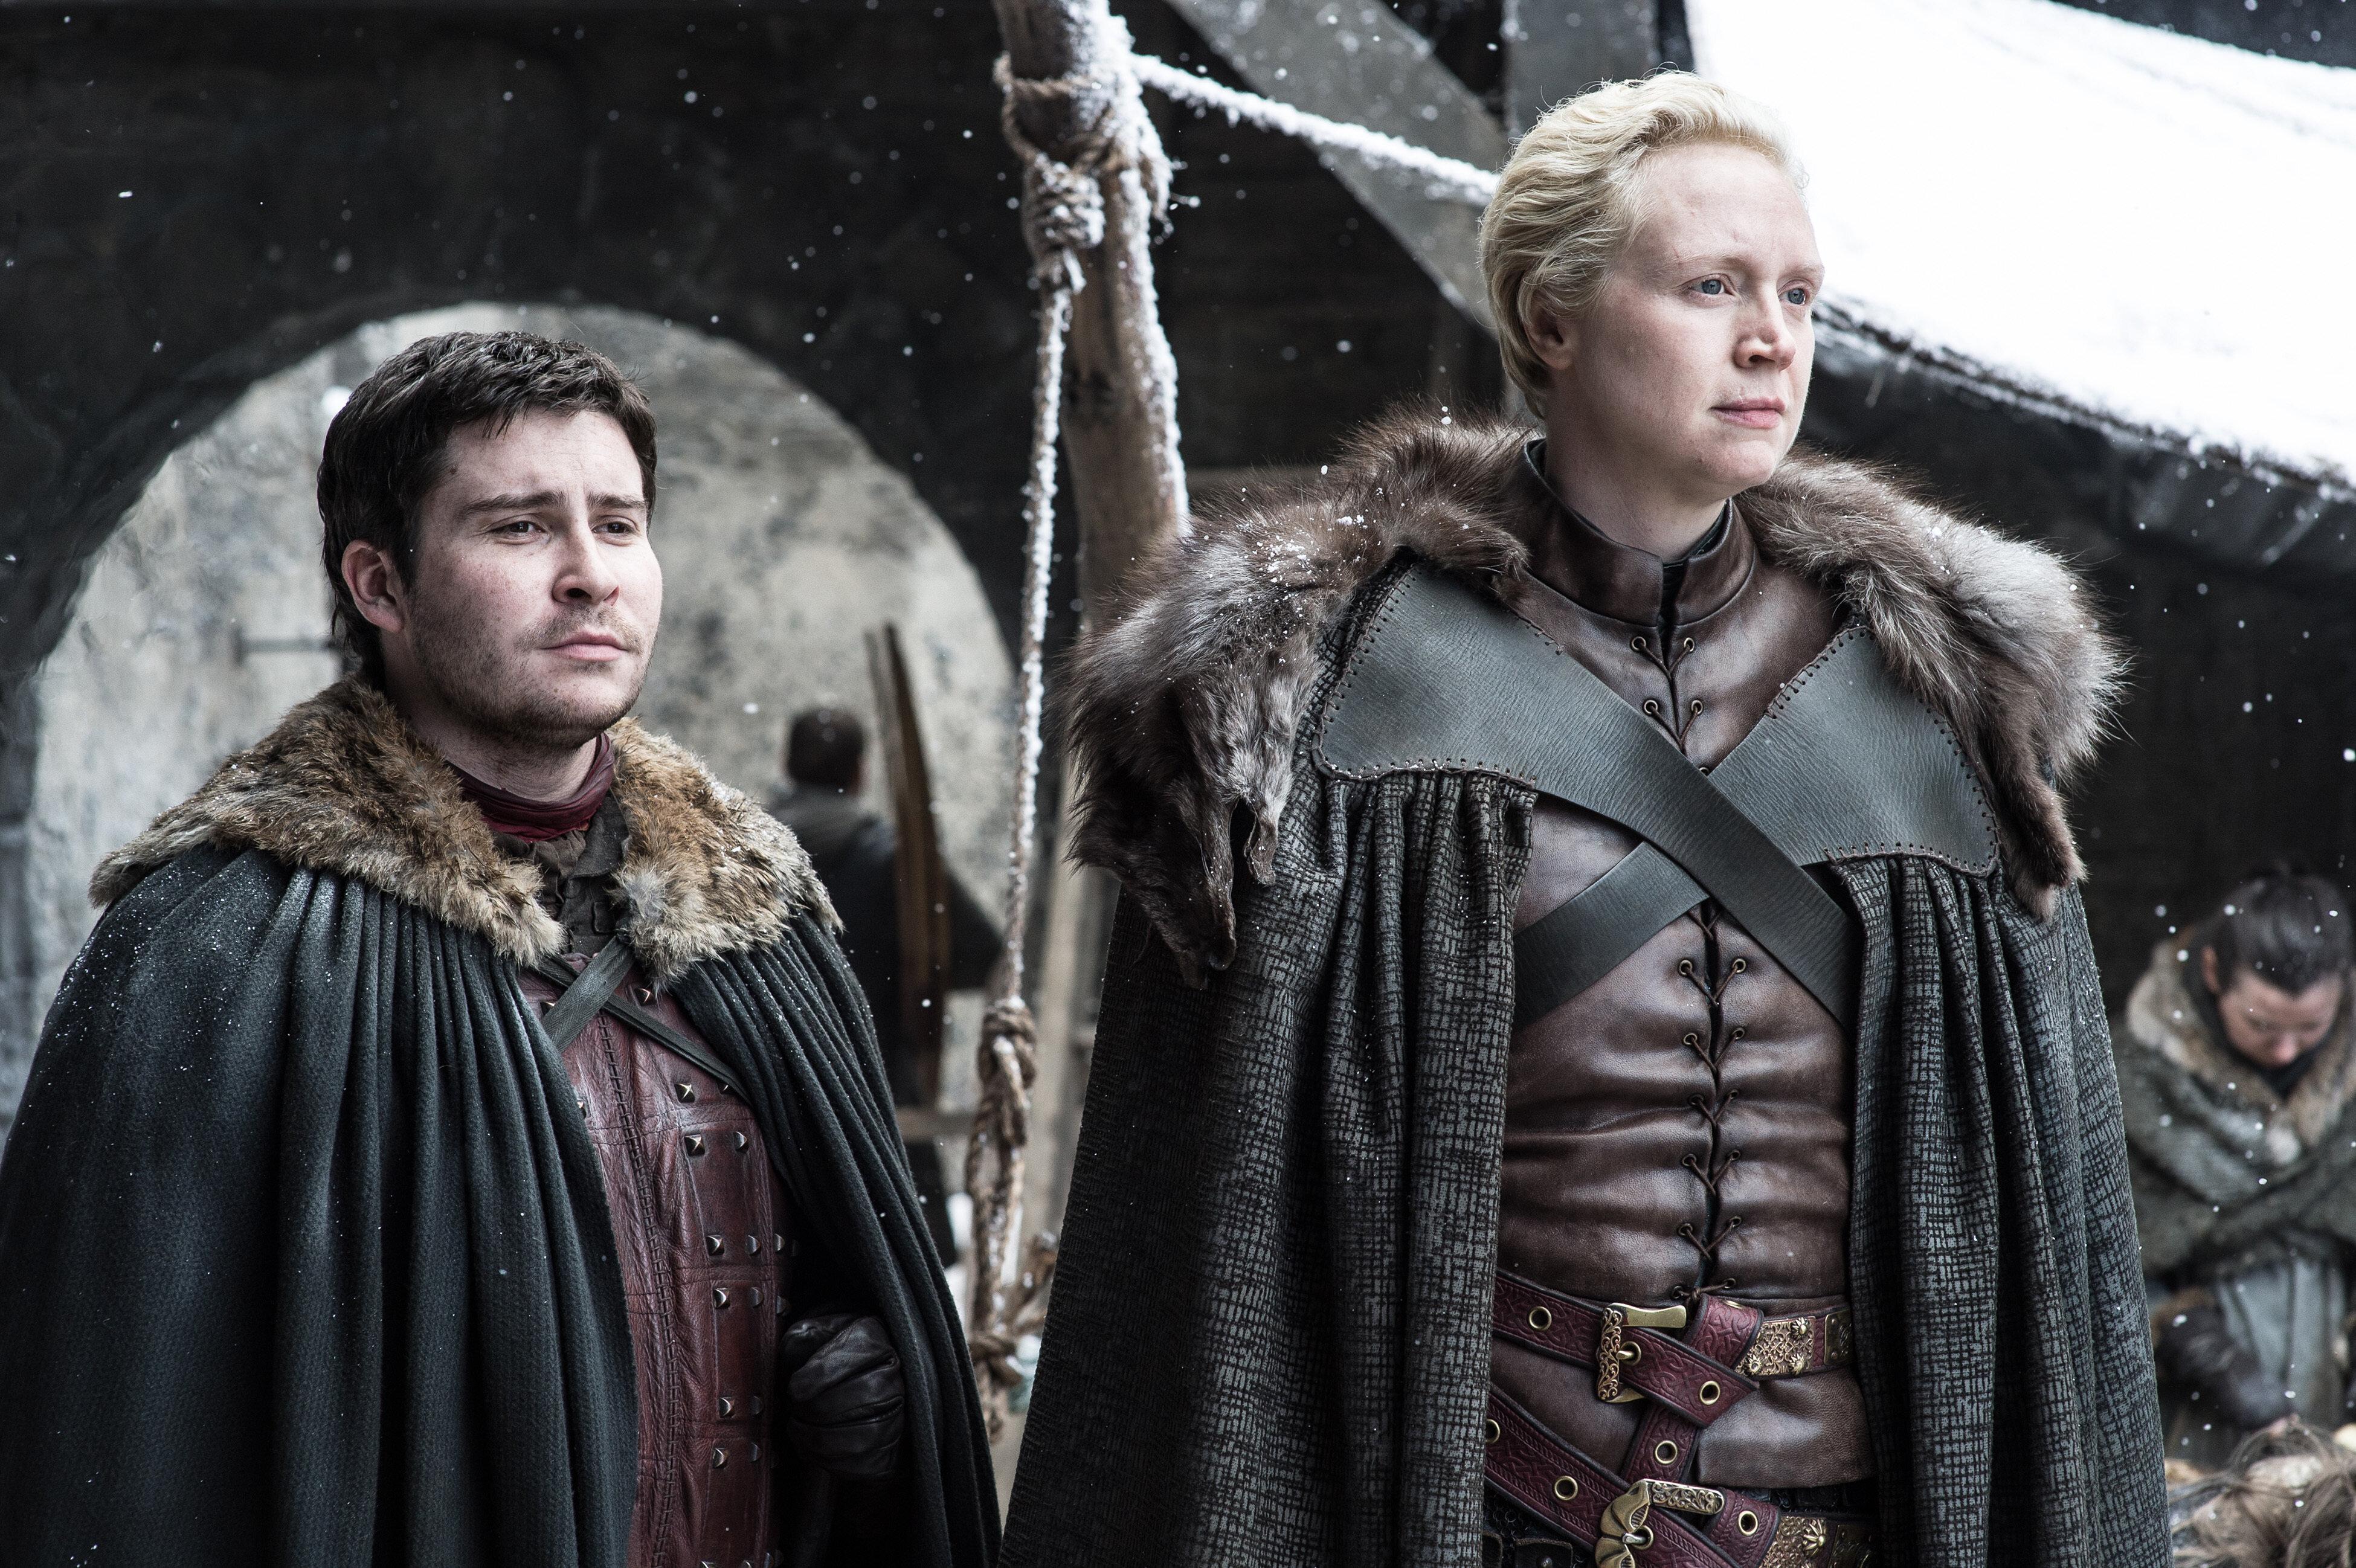 'Game Of Thrones' Star Daniel Portman Says 'So Many' Podrick Fans Have Groped Him